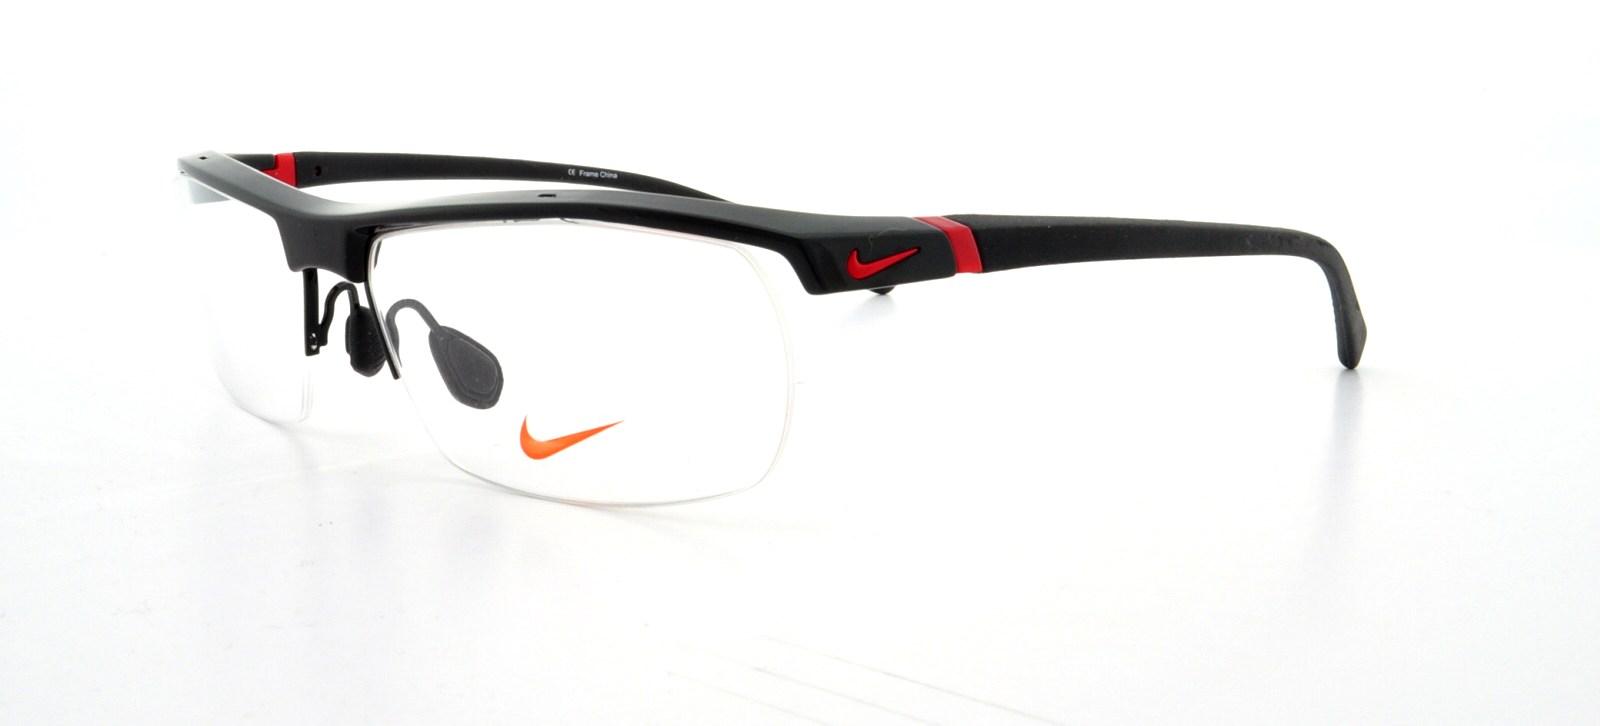 8619cccd99b9d Designer Frames Outlet. Nike 7071 2